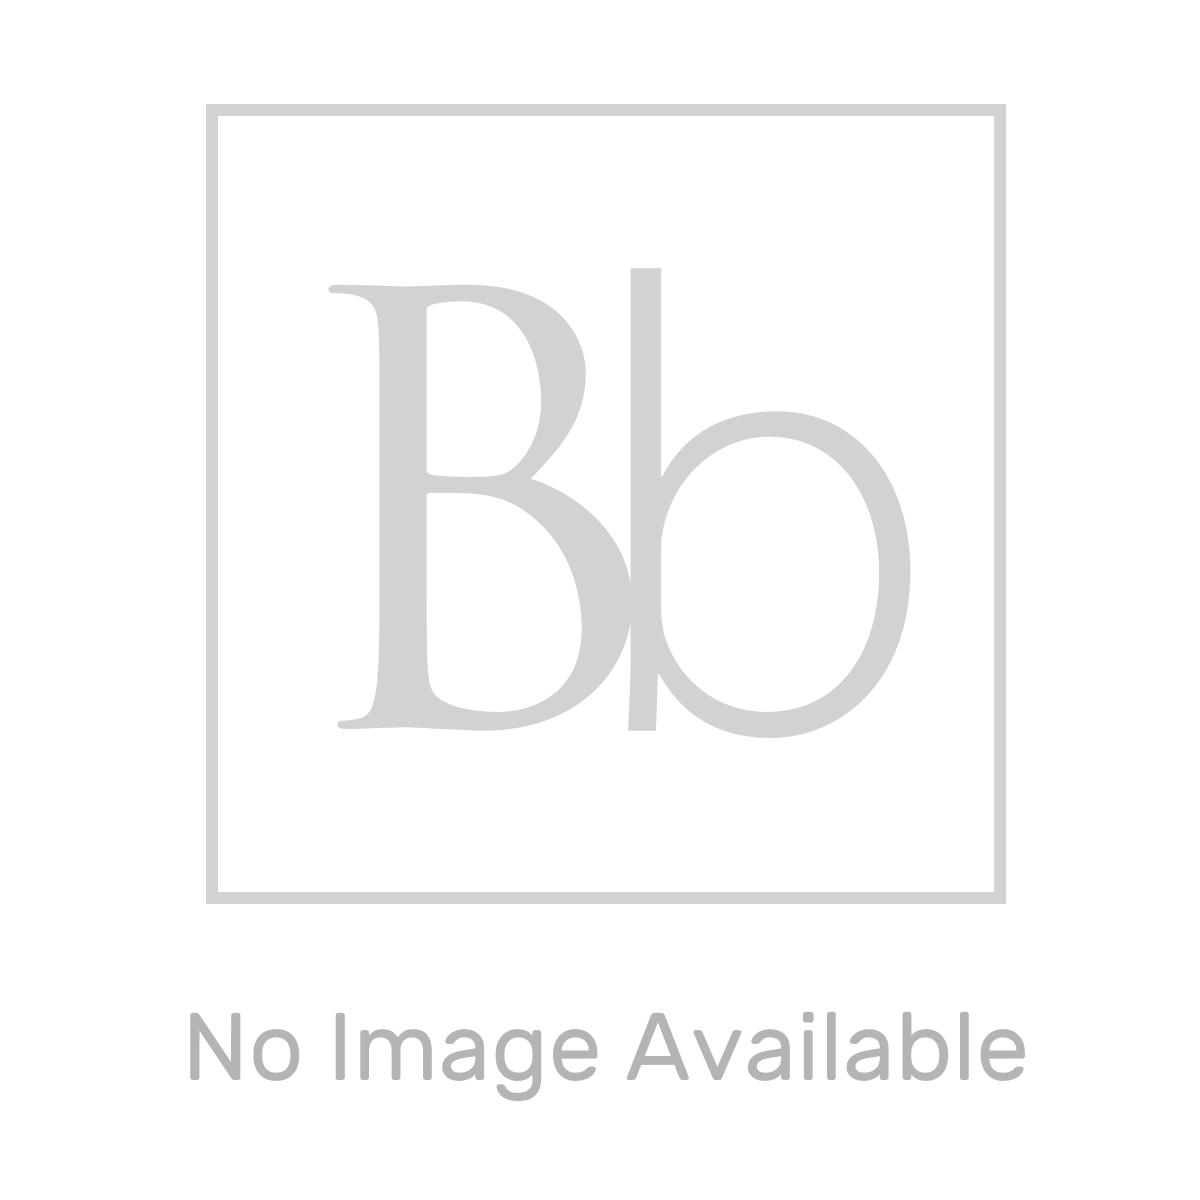 Elation Ikoma Pearl Grey Matt Mirror Unit 850mm Dimensions